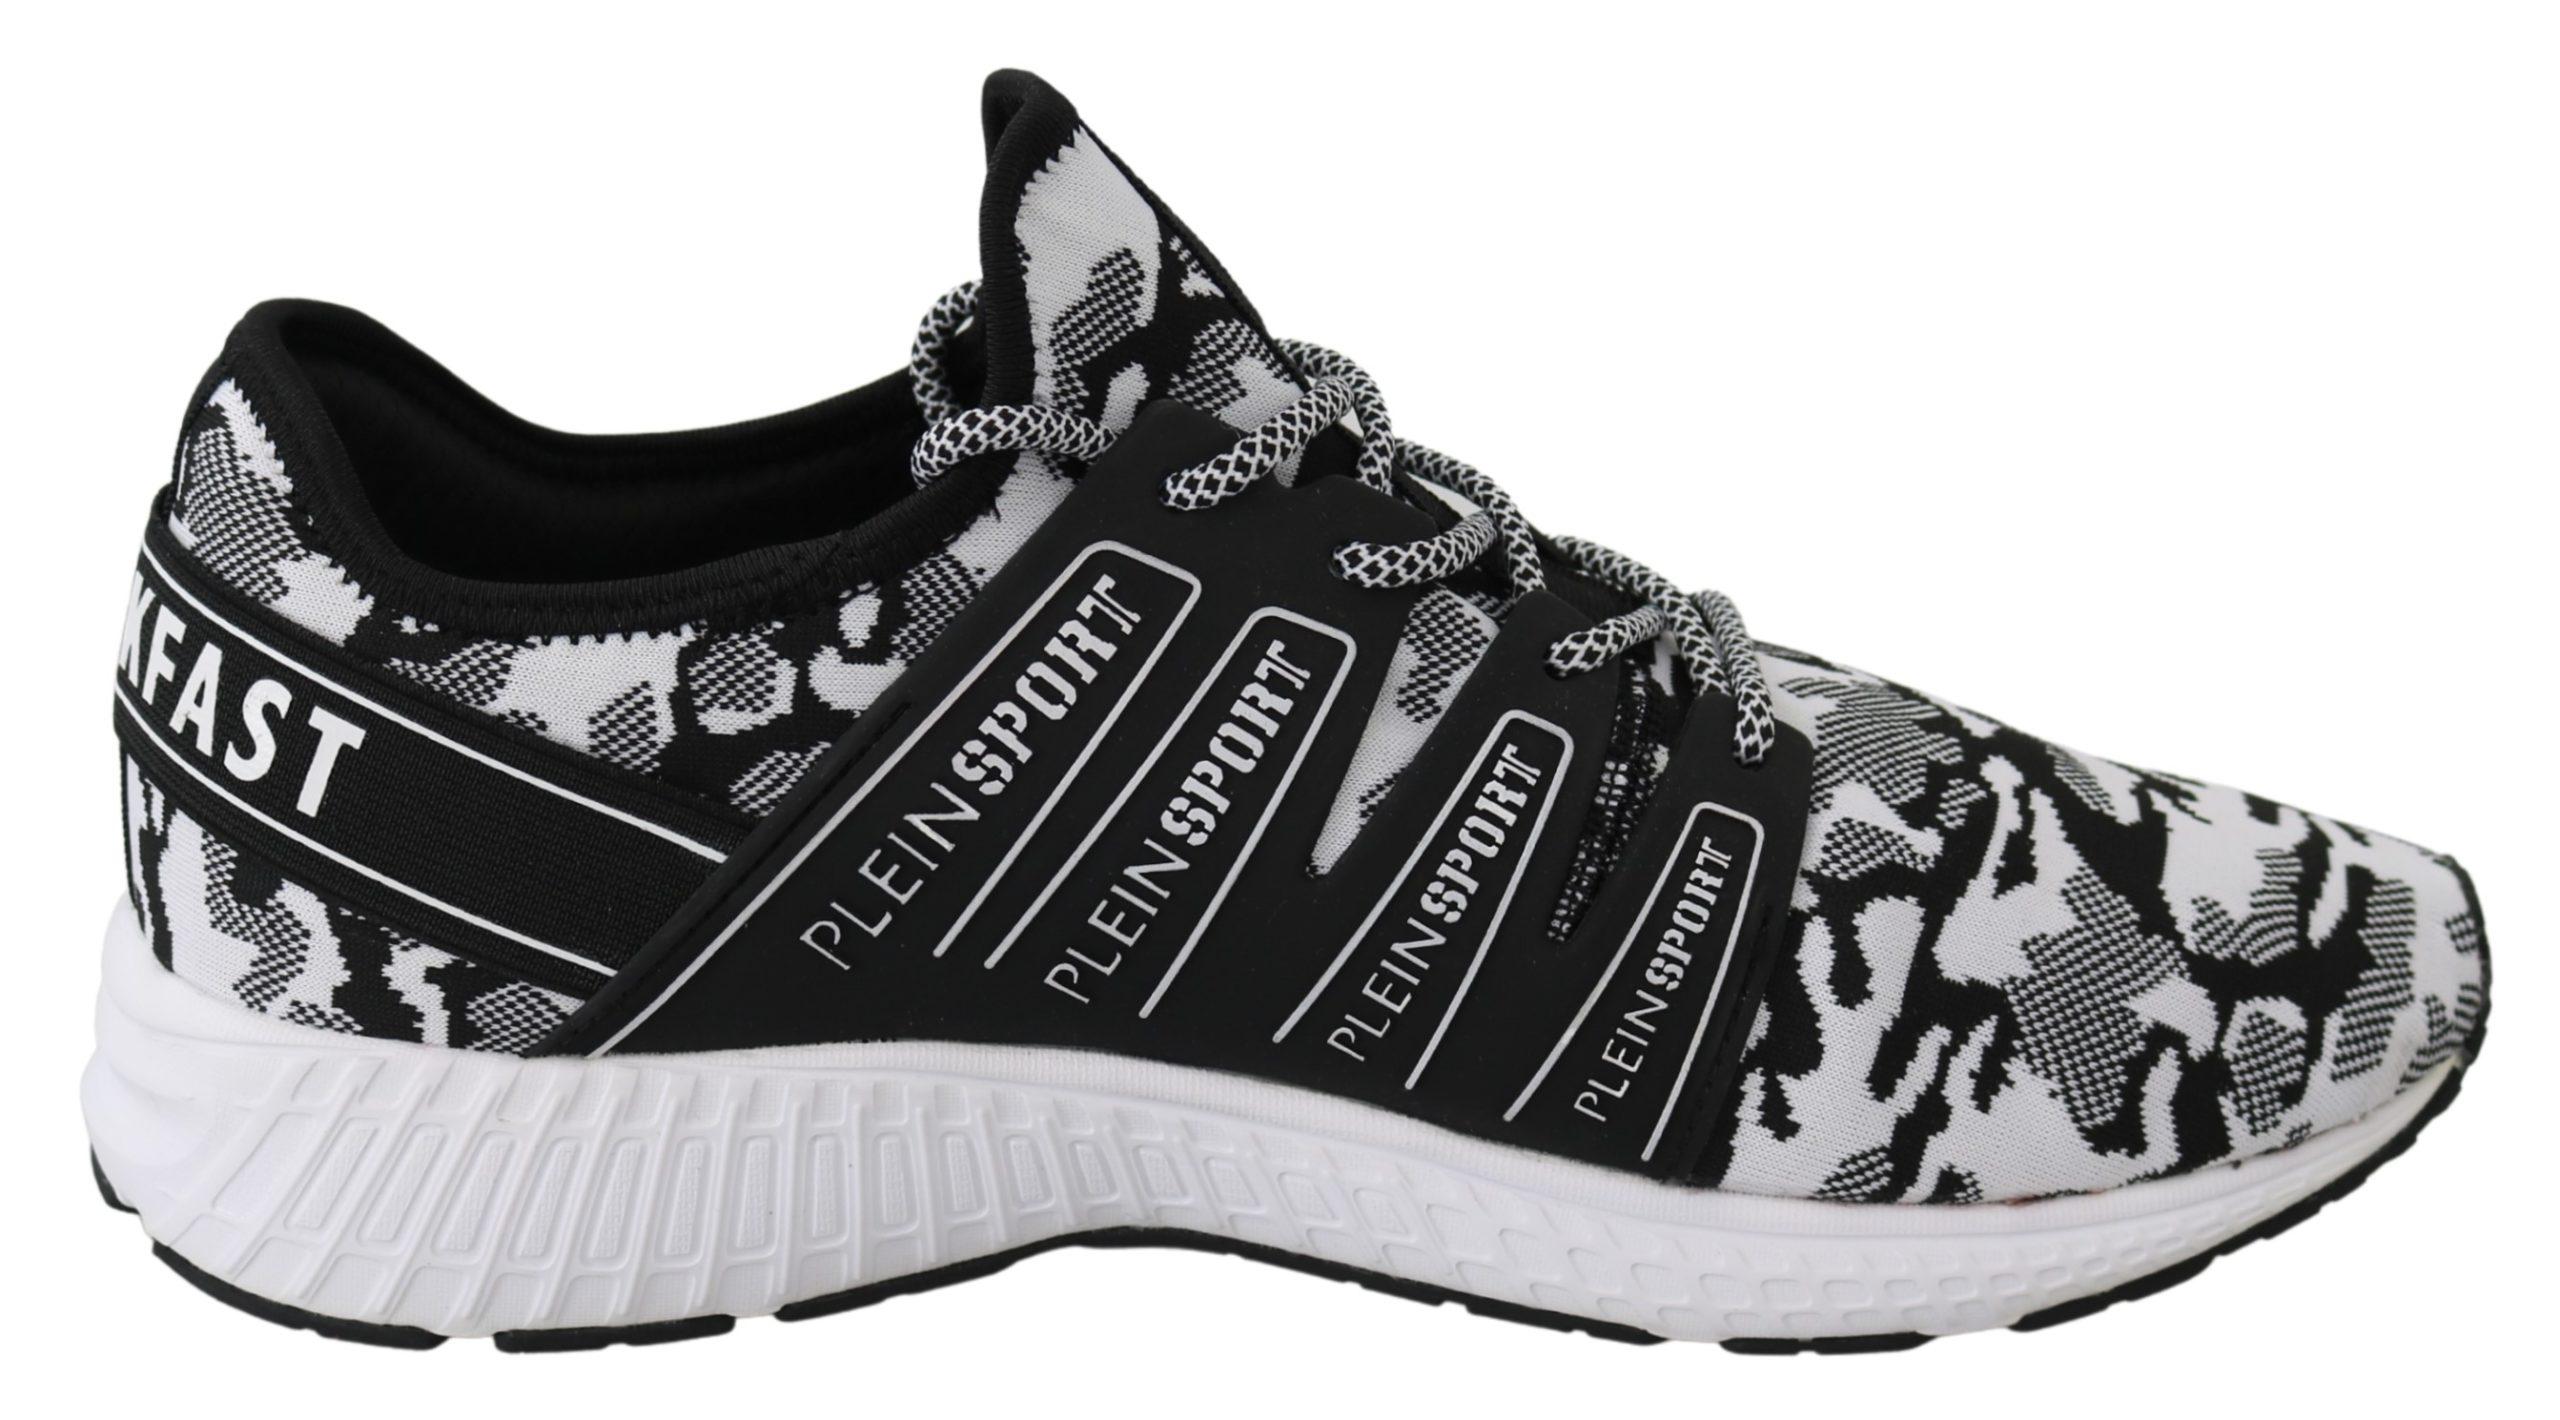 White Polyester Runner Backside Sneakers Shoes - EU41/US8